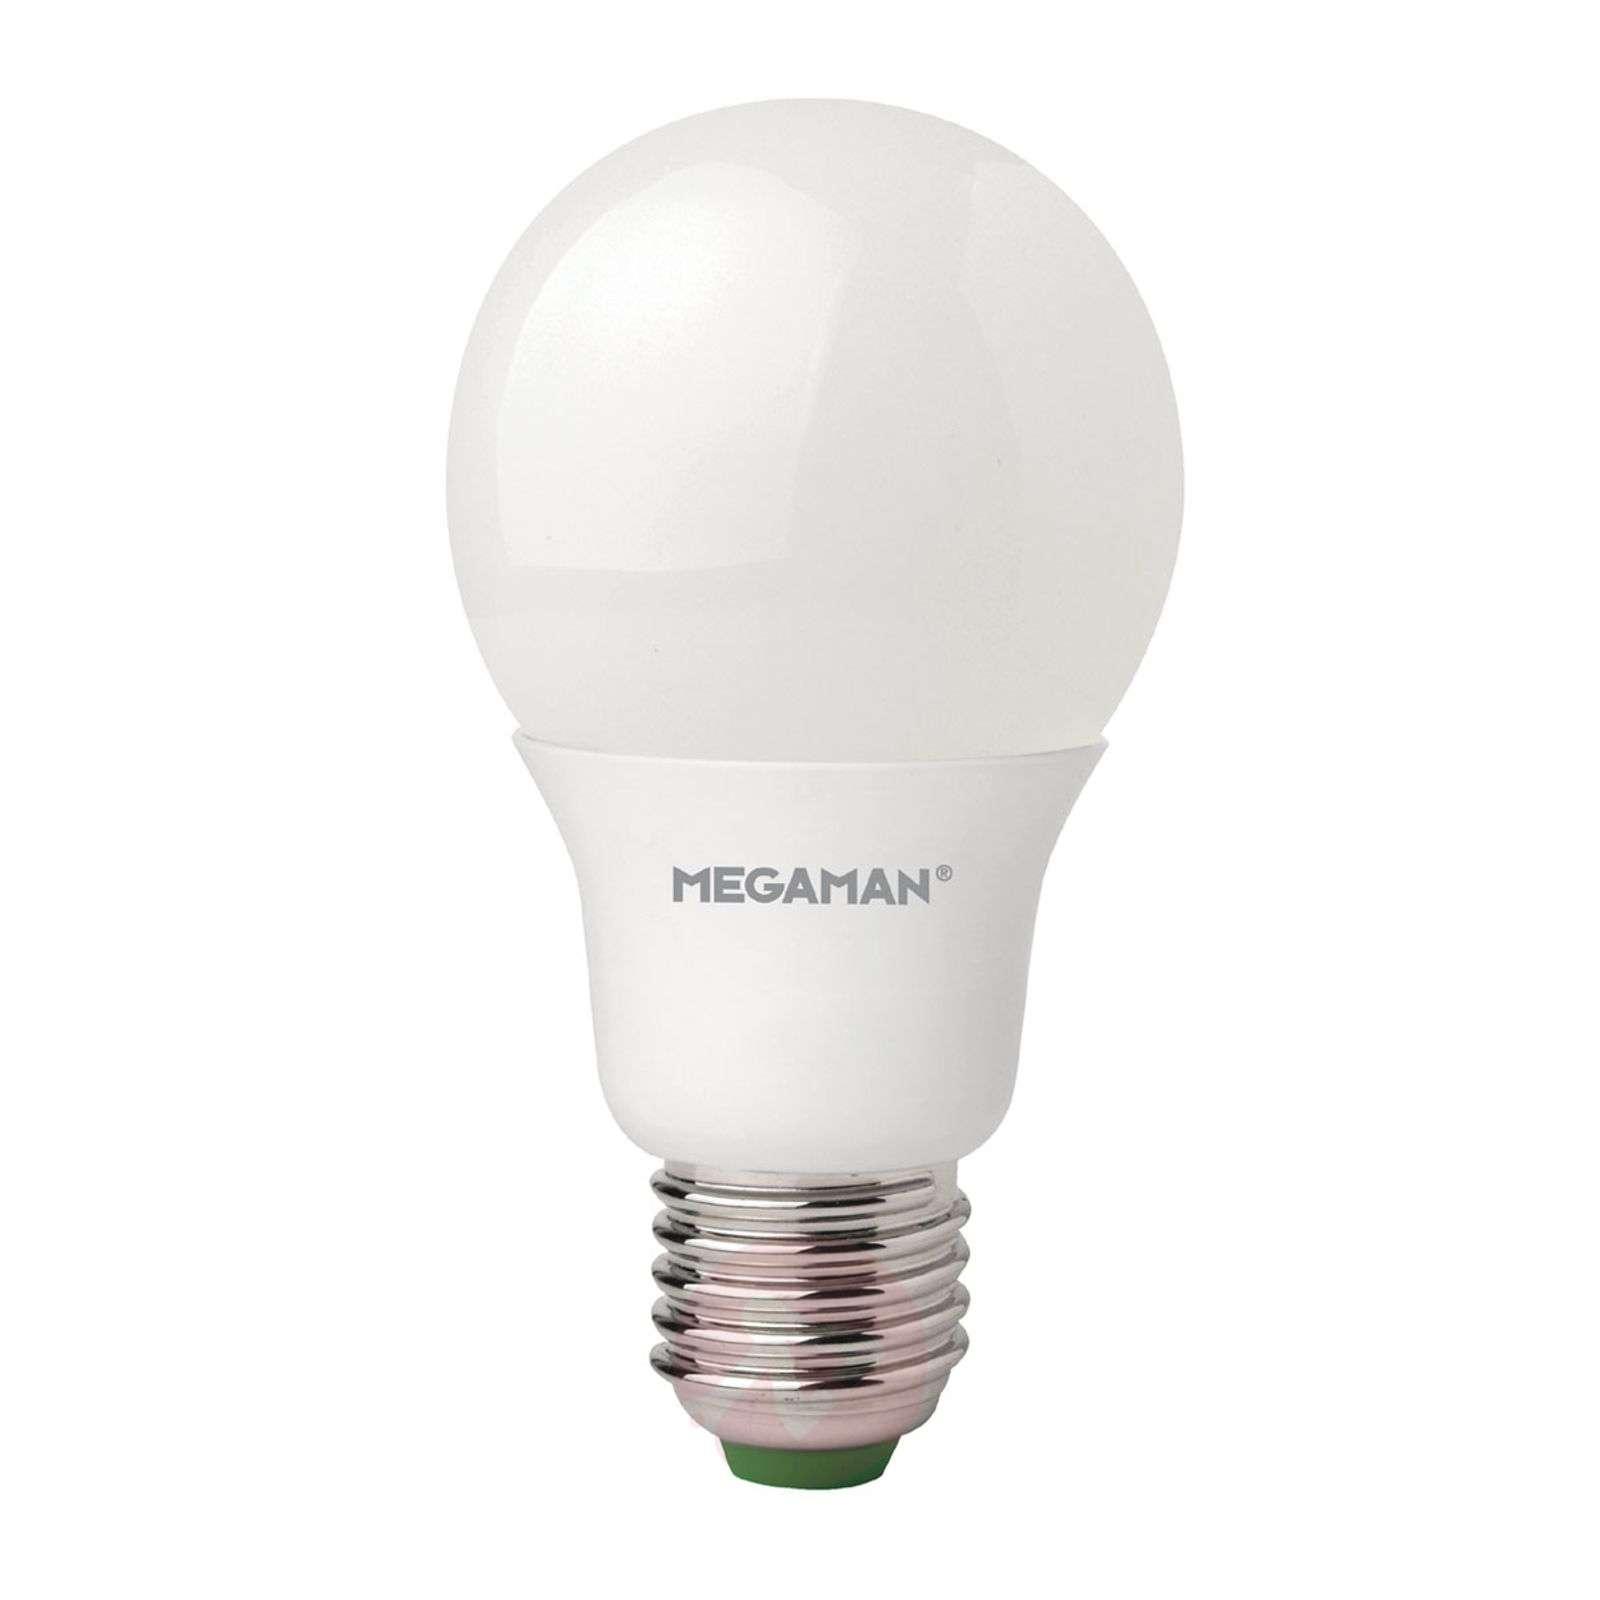 E27 6.5W LED plant bulb MEGAMAN-6530149-01